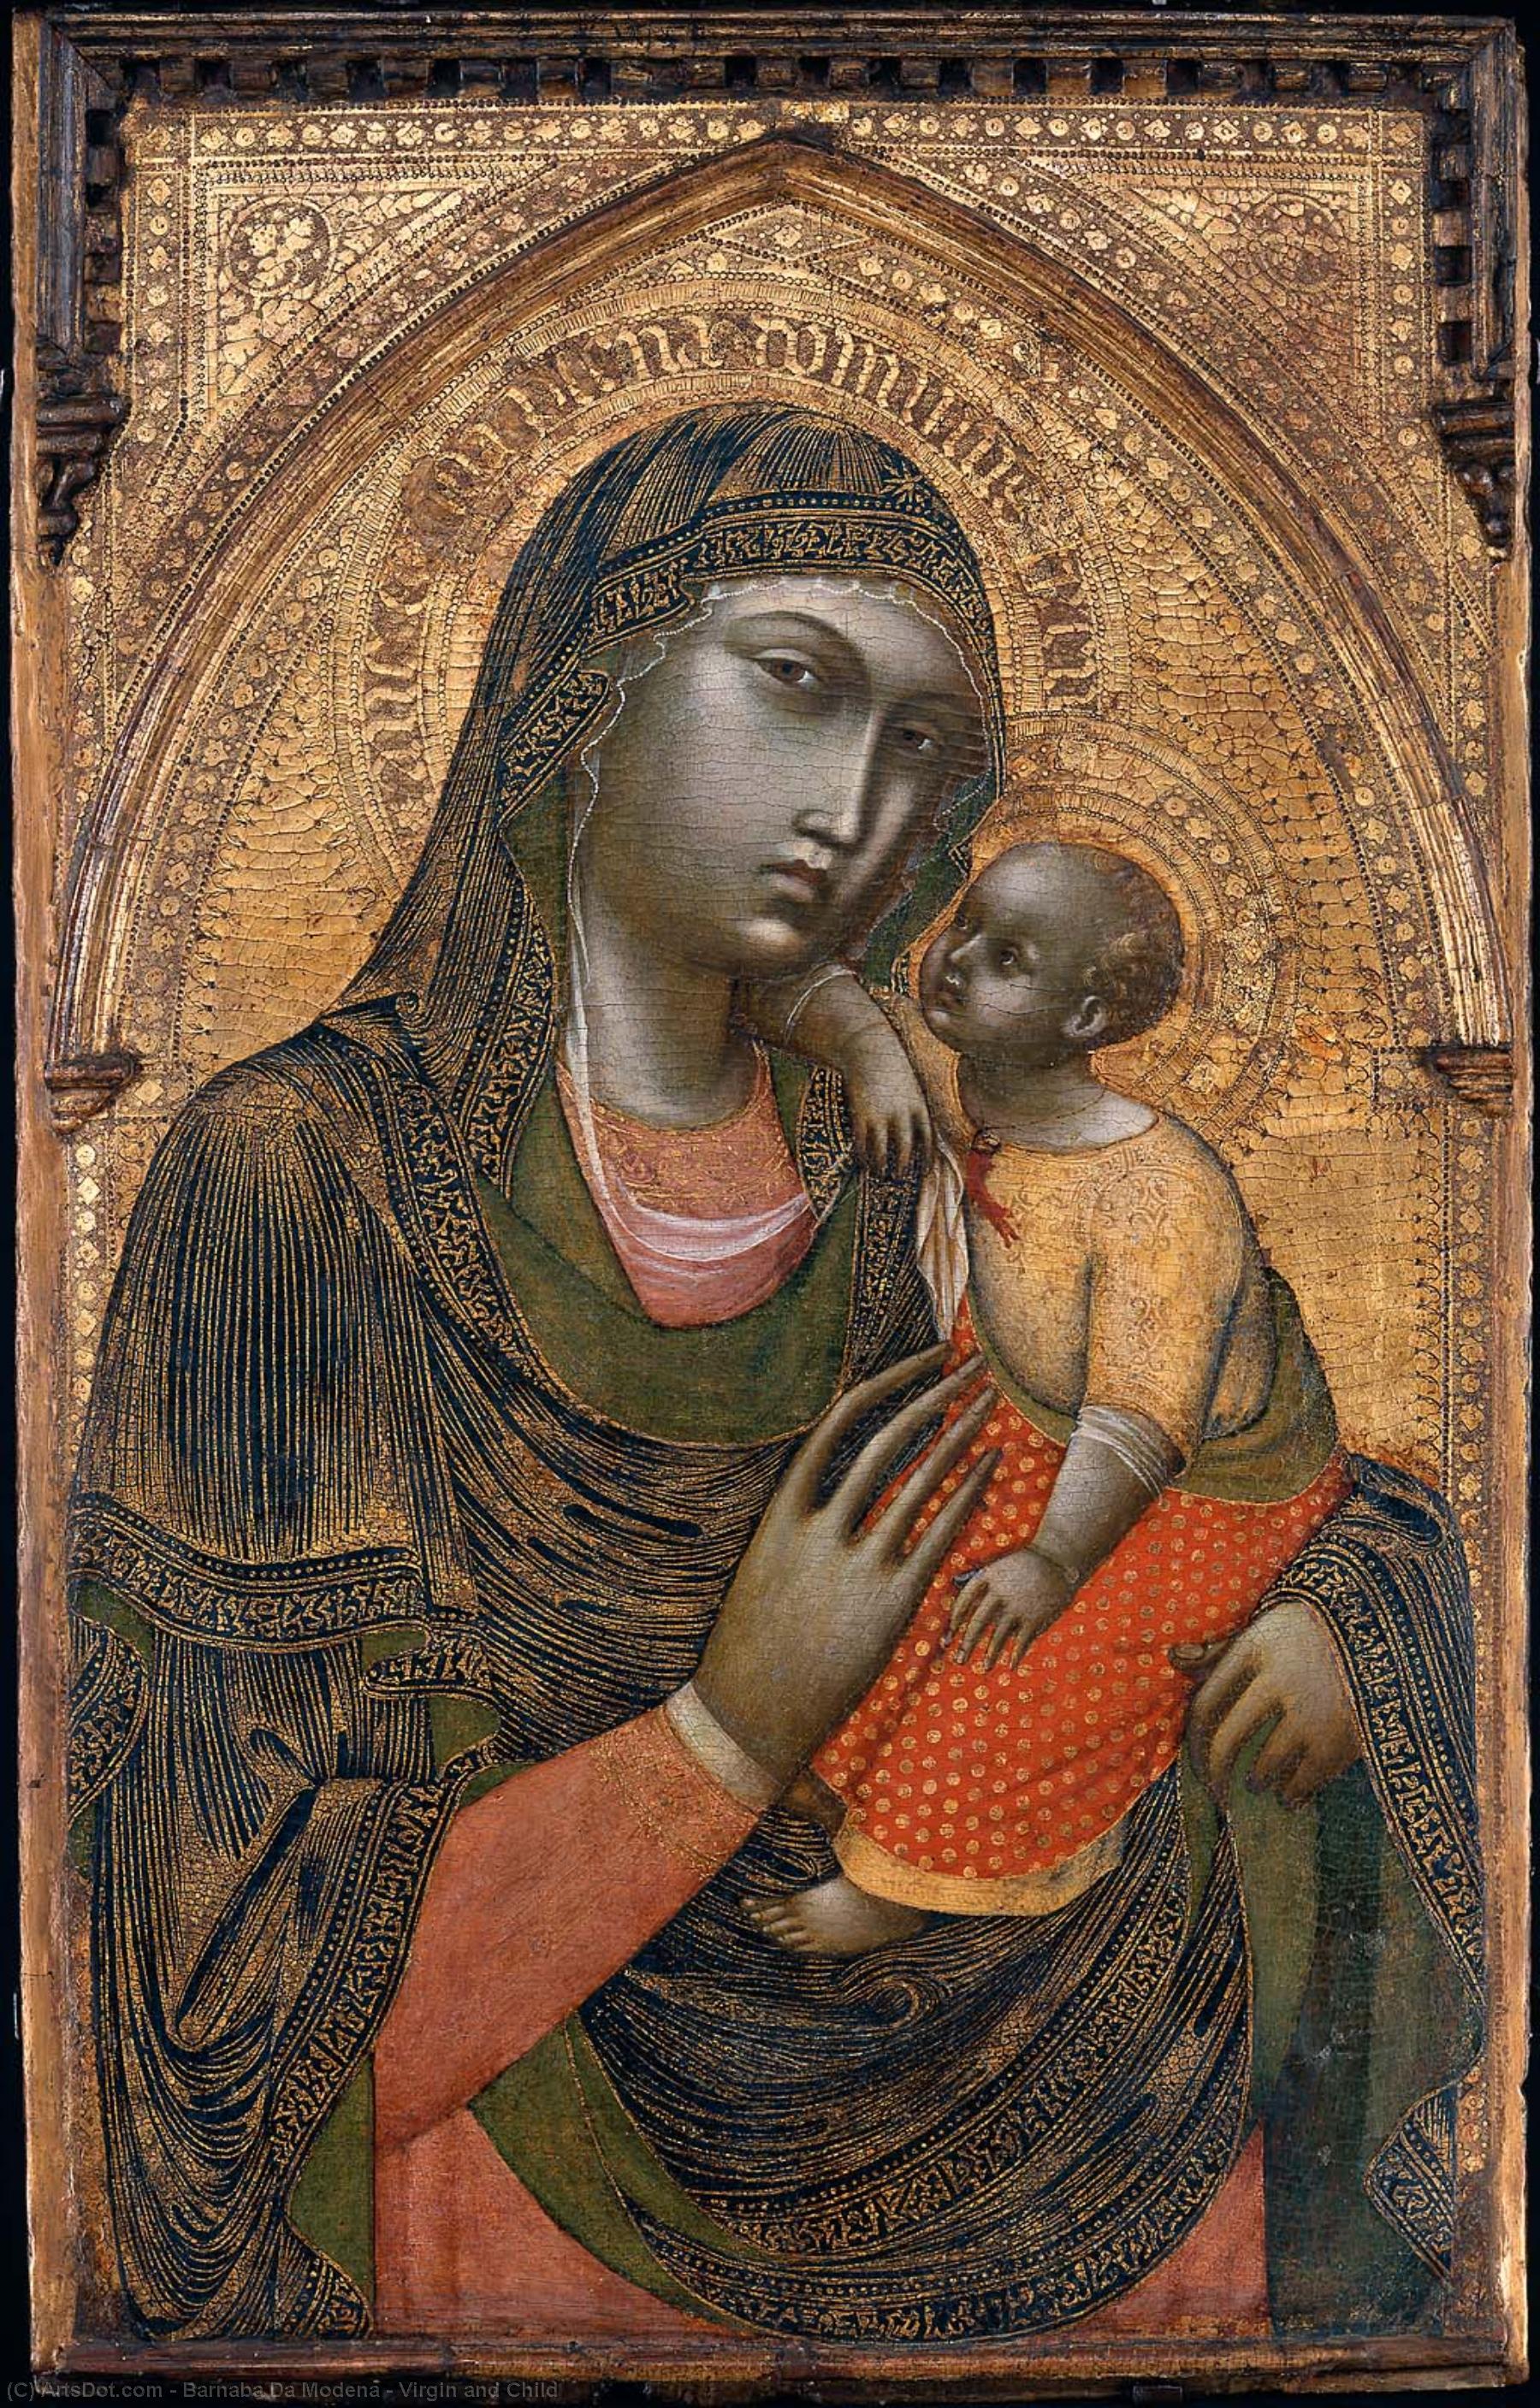 WikiOO.org - Enciklopedija dailės - Tapyba, meno kuriniai Barnaba Da Modena - Virgin and Child